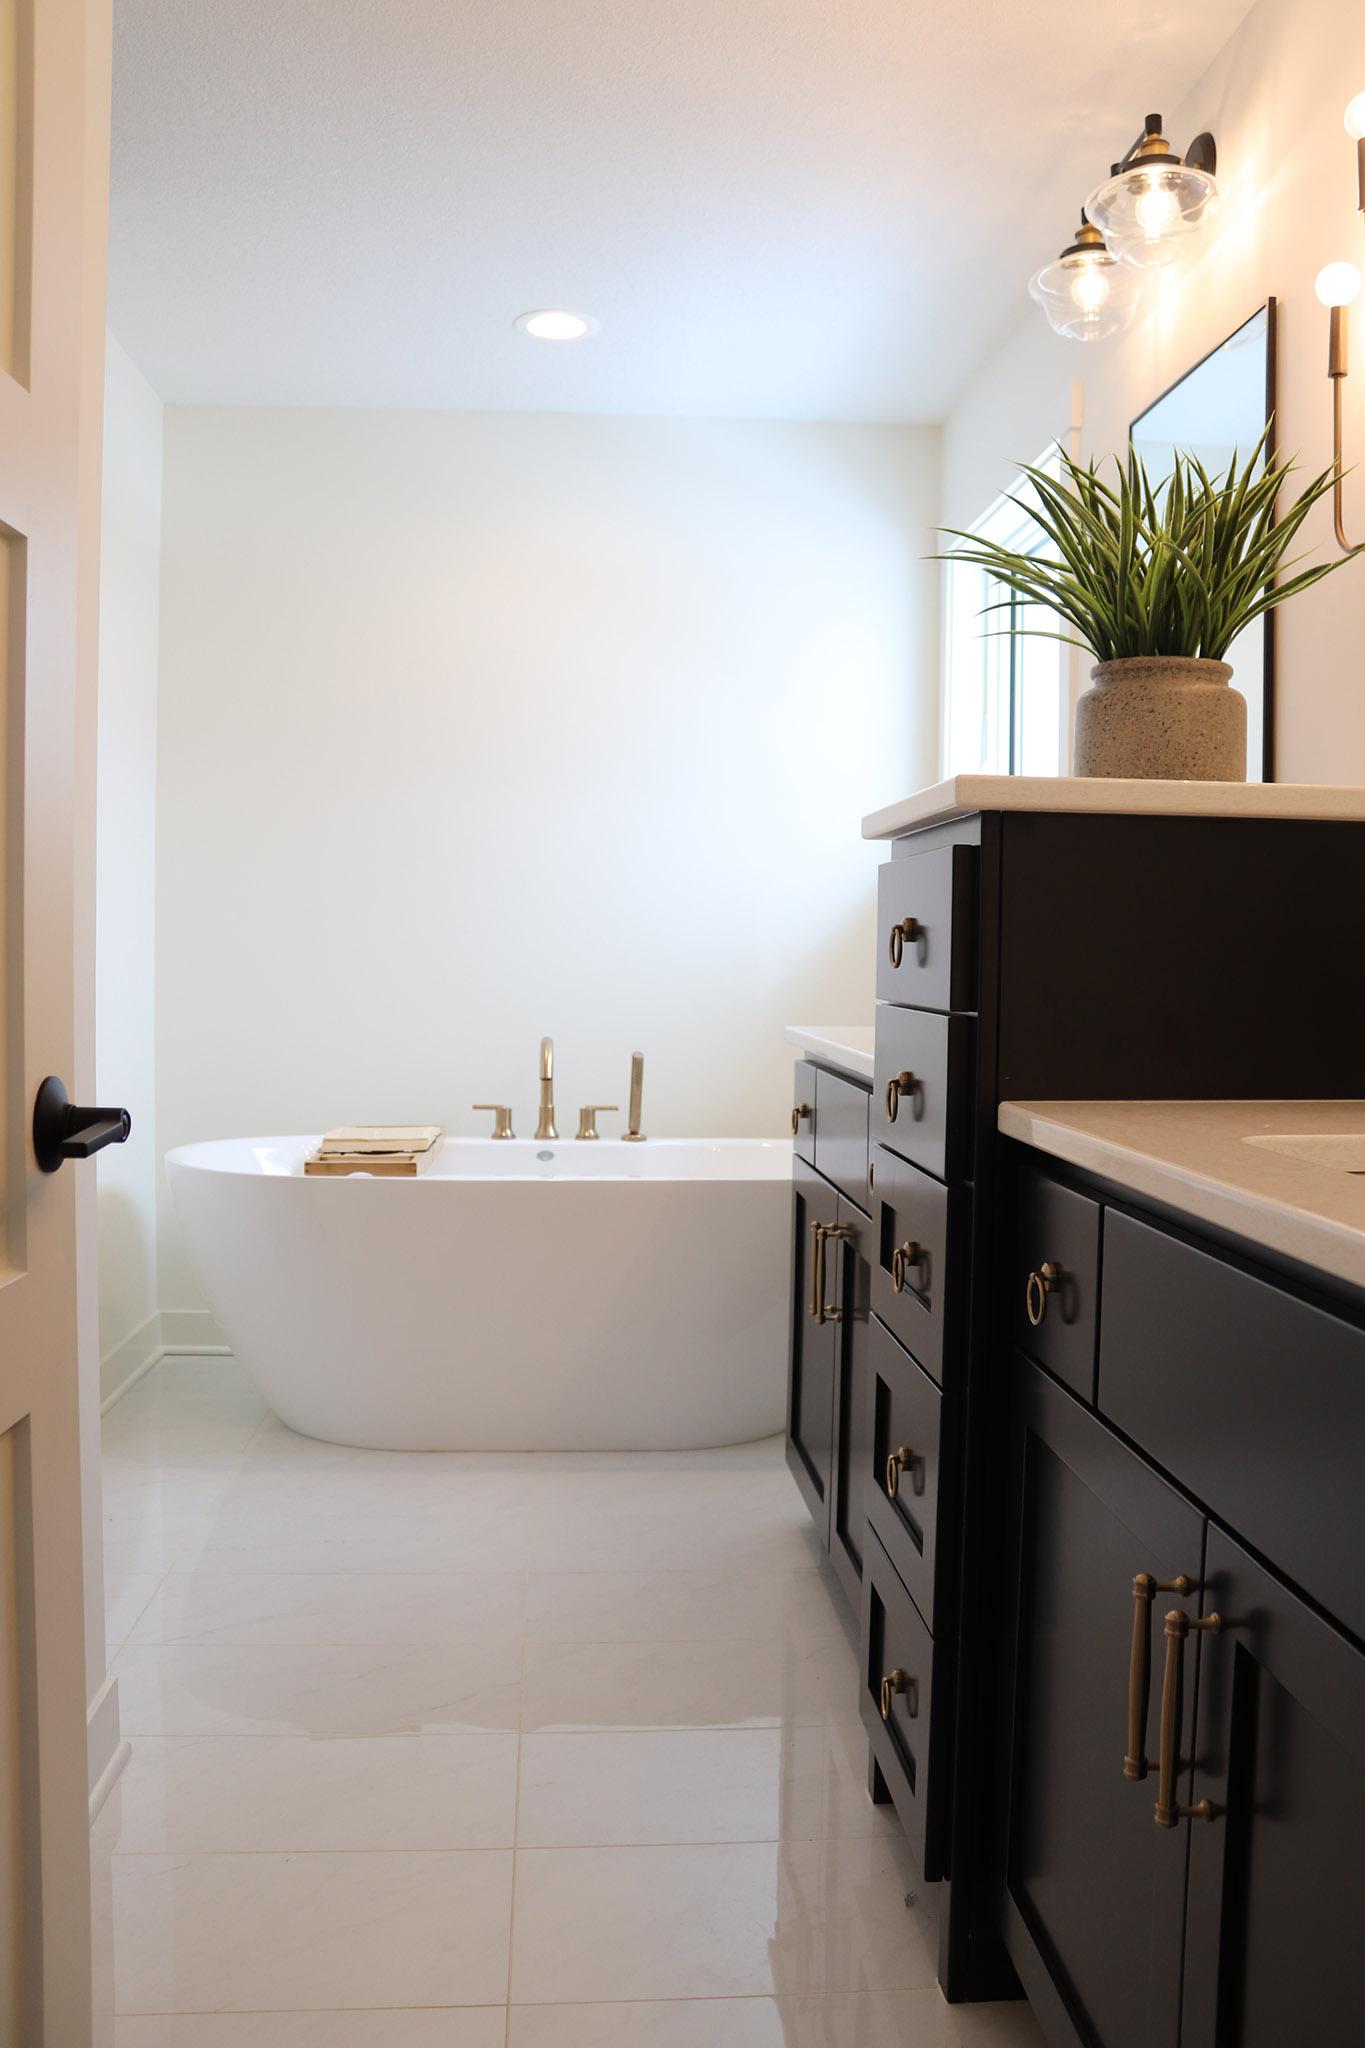 Master bath with free standing tub, custom cabinet vanity and granite vanity tops